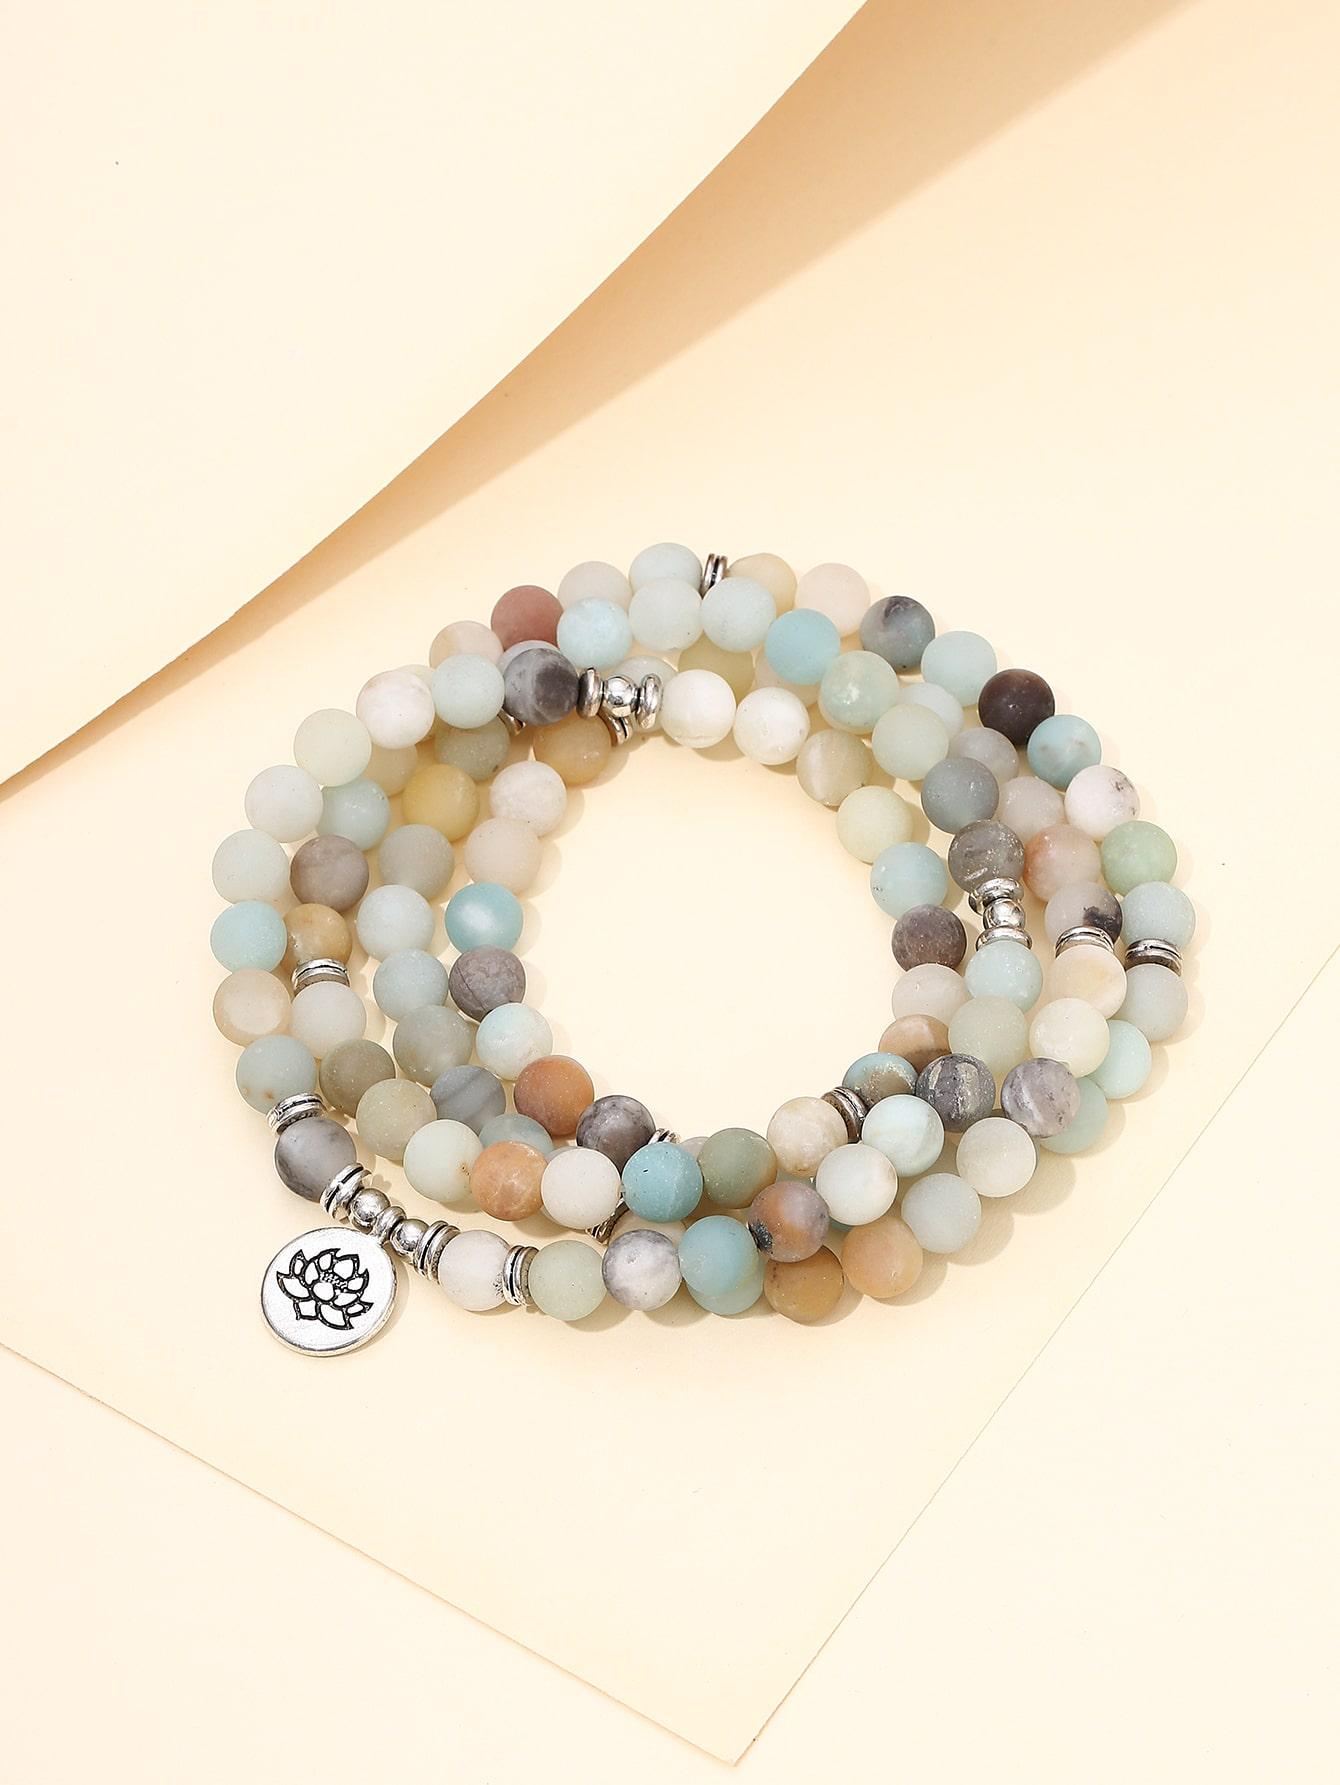 50 Gift Ideas for Mums | Beaded Bracelets | Beanstalk Mums